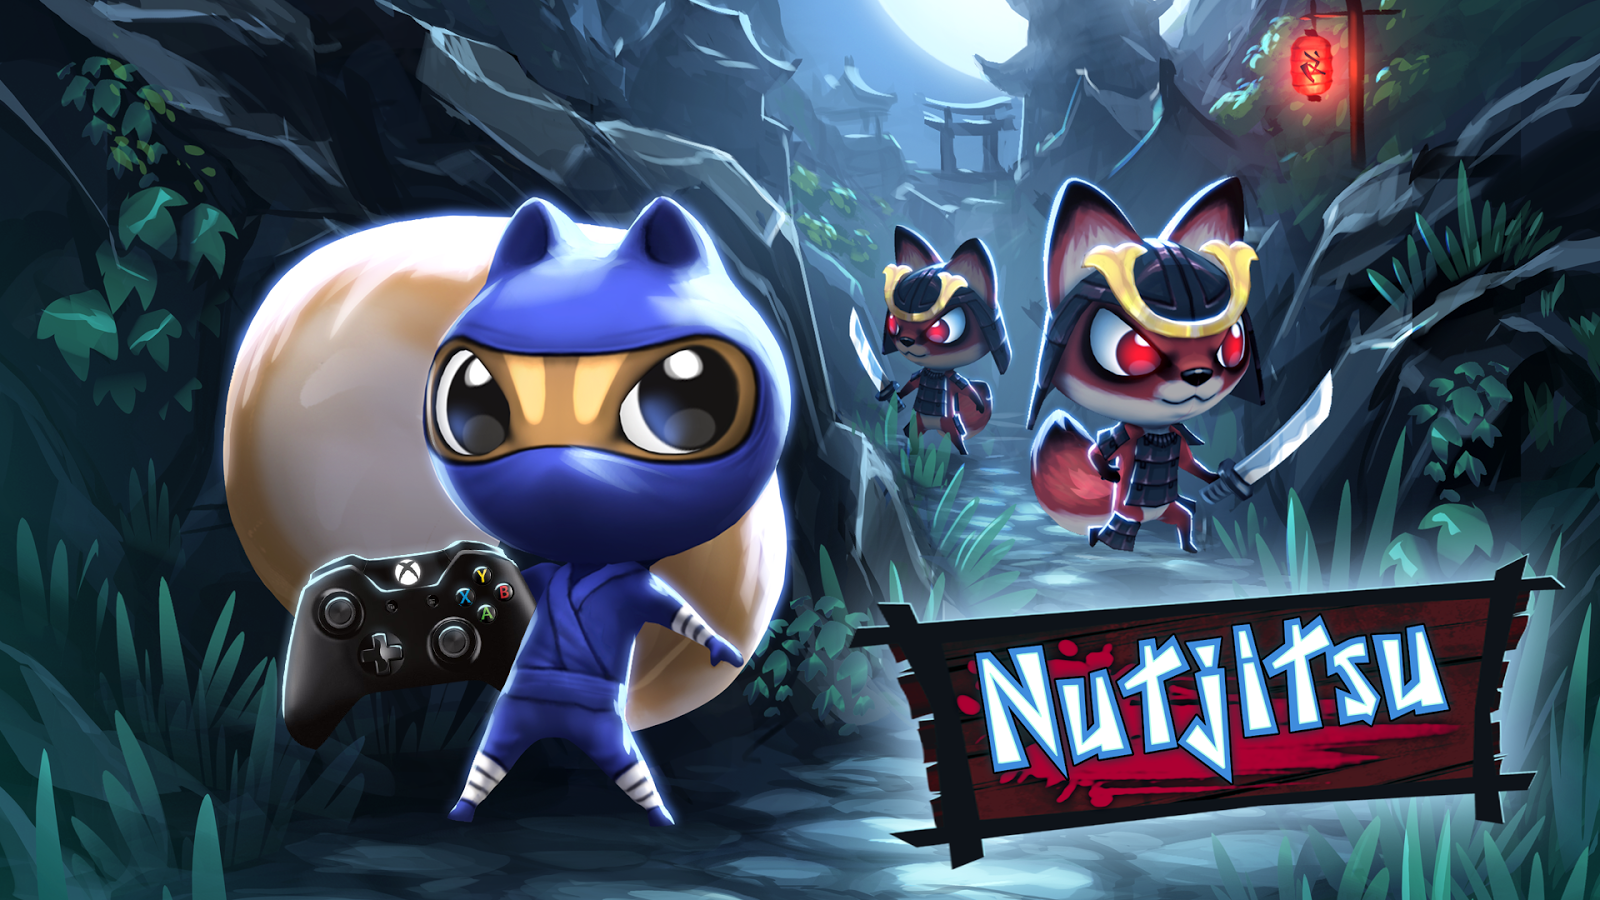 Nutjitsu xboxone http downloadtorrentsgames com xbox one